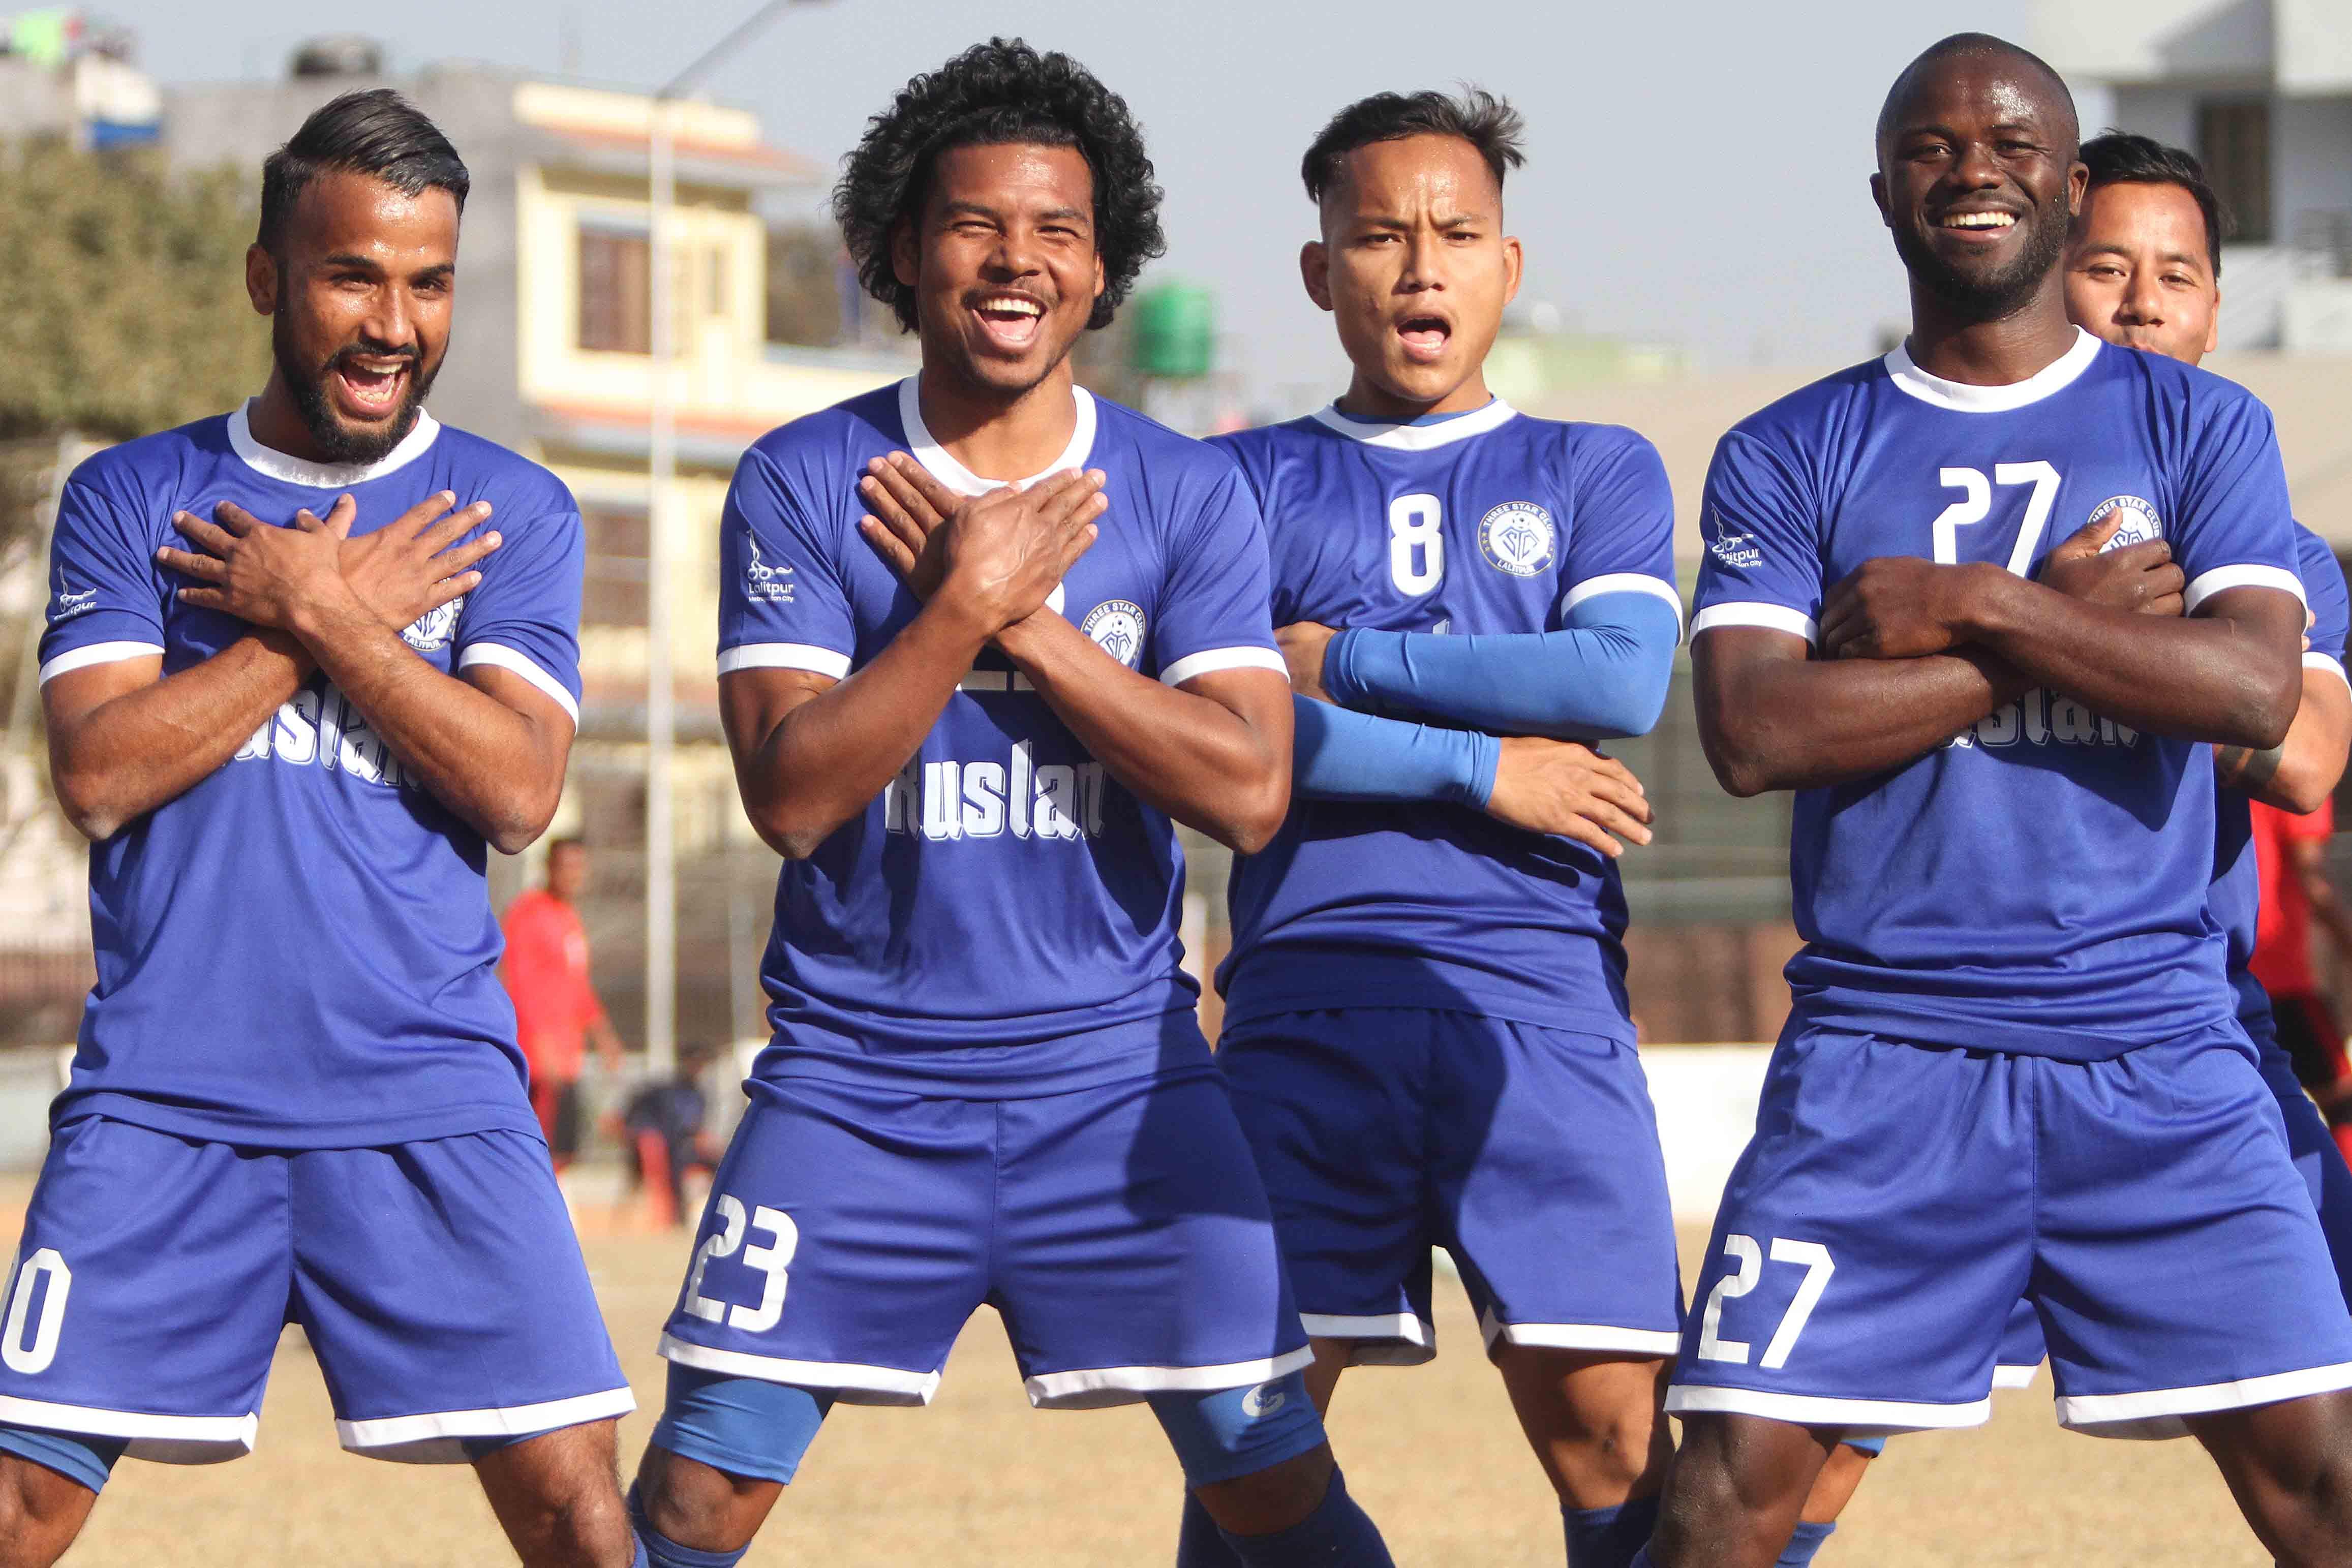 Ranjit Dhimal (second from left) of Three Star Club celebrates spot kick goal with team mates against Machhindra Football Club during their Pulsar Martyru2019s Memorial u2018Au2019 Division League match at APF Stadium in Kathmandu on Saturday. Photo: Udipt Singh Chhetry